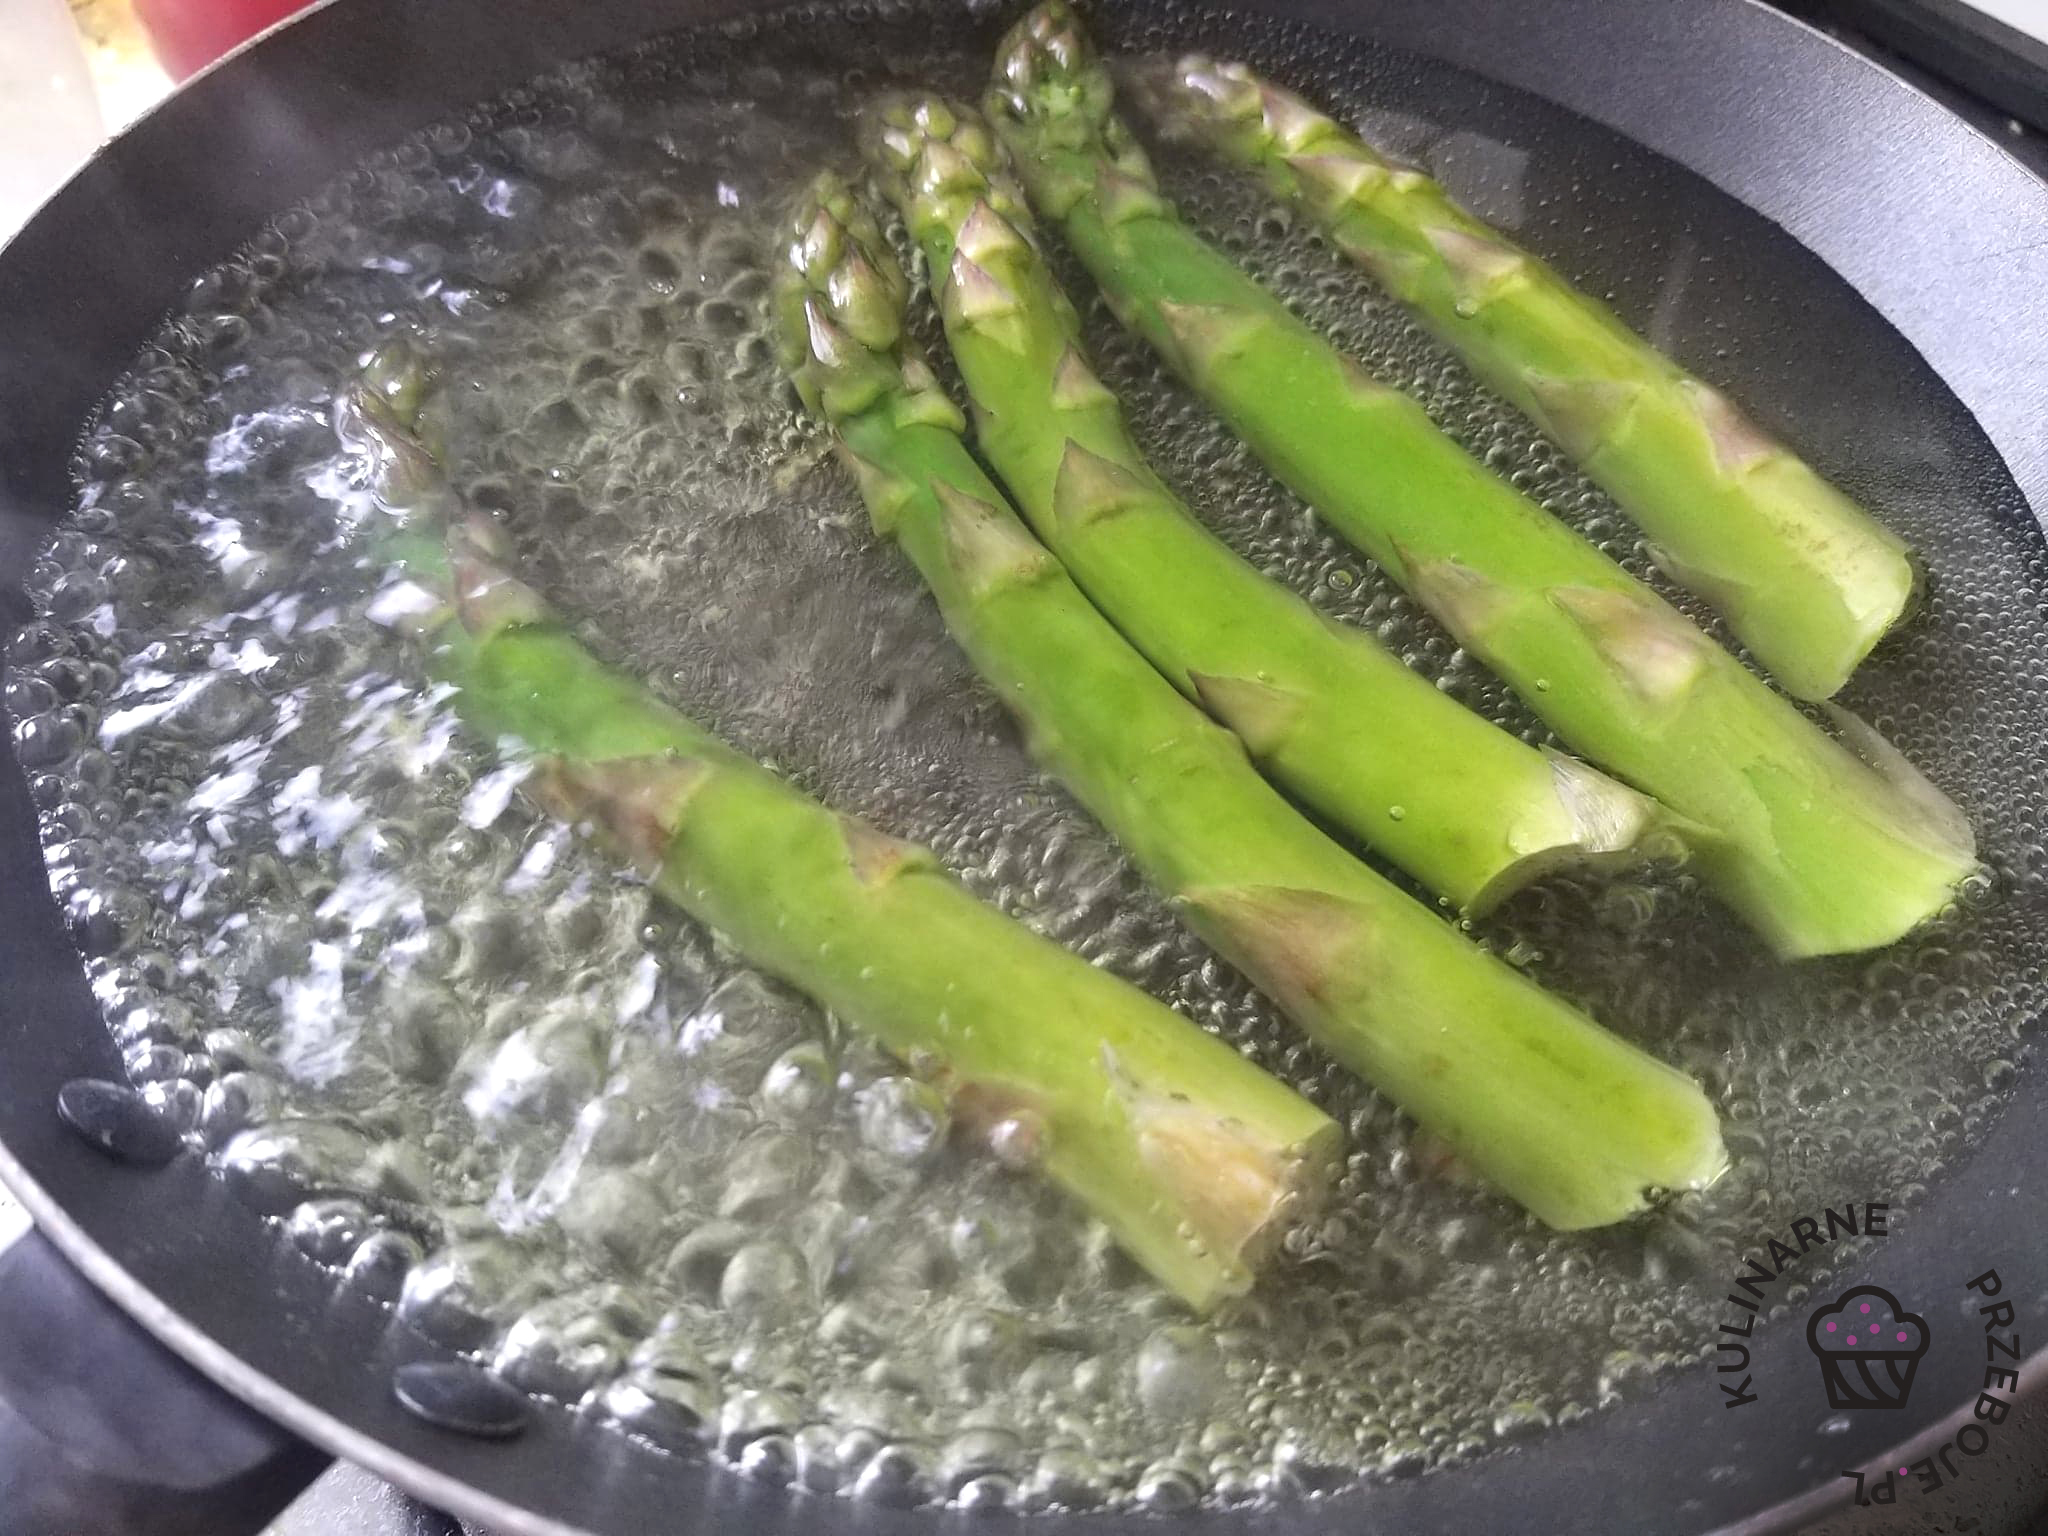 szparagi gotowane na patelni